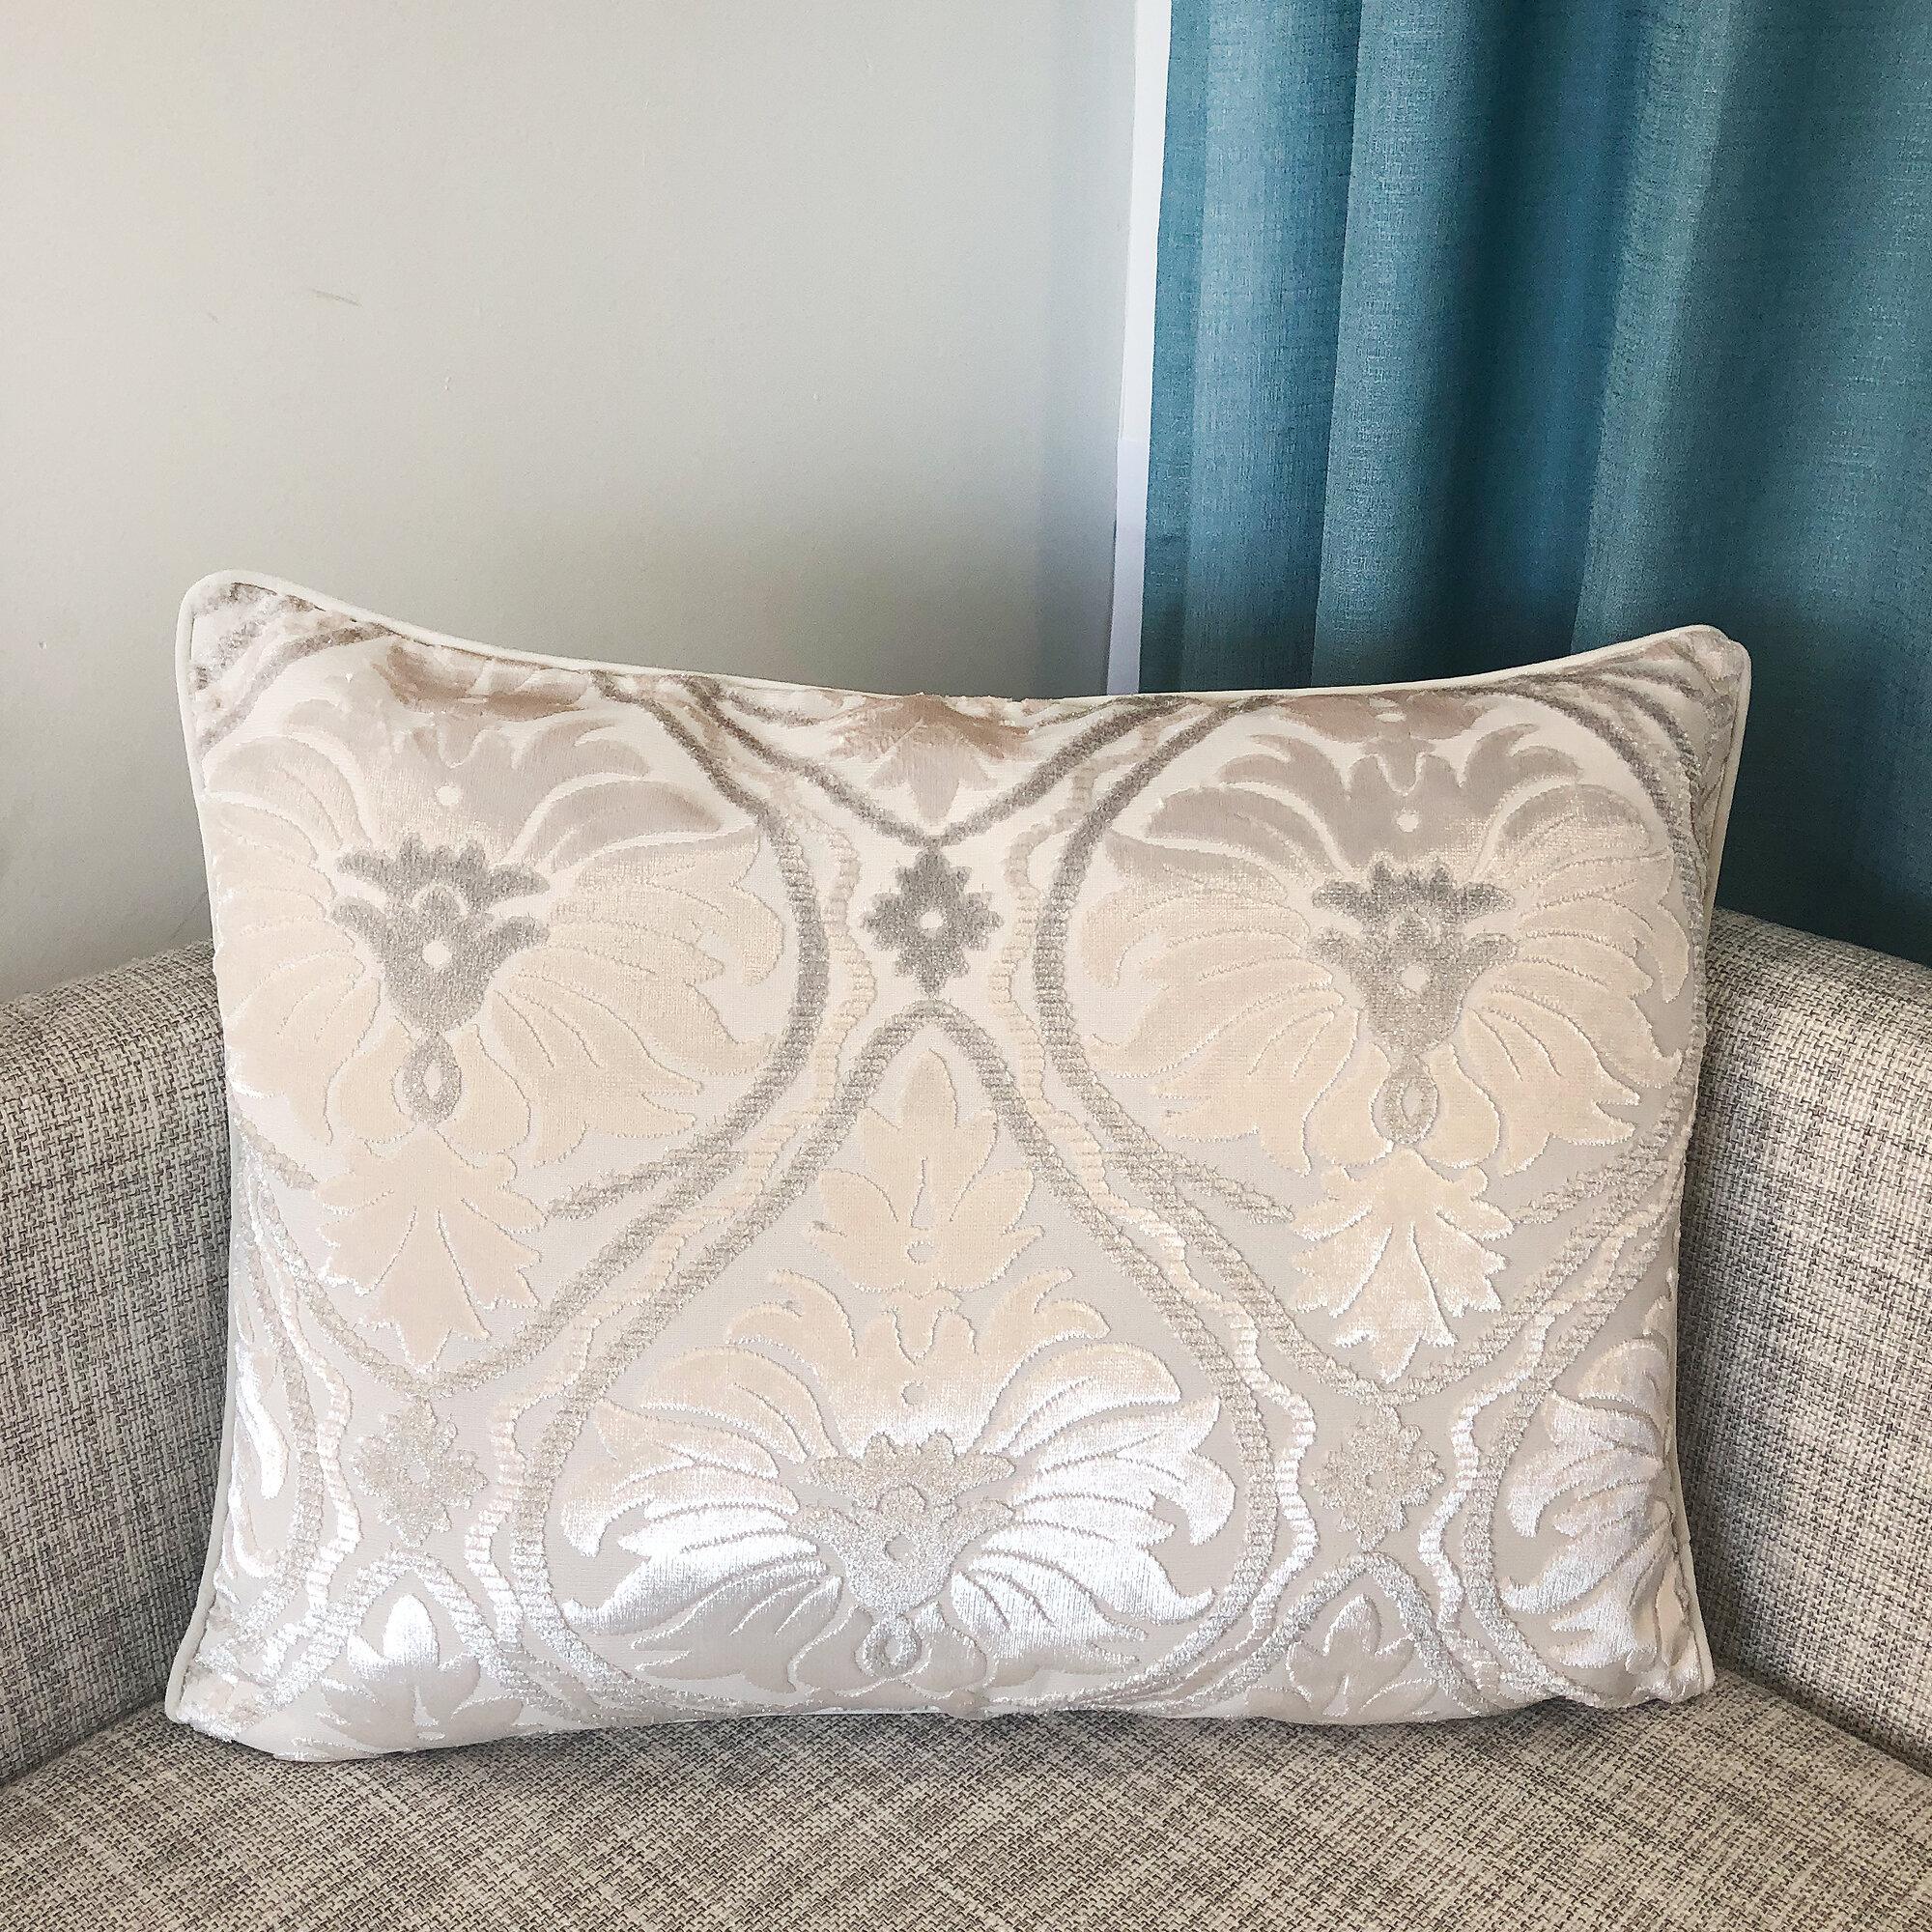 Lumbar Rosdorf Park Throw Pillows You Ll Love In 2021 Wayfair